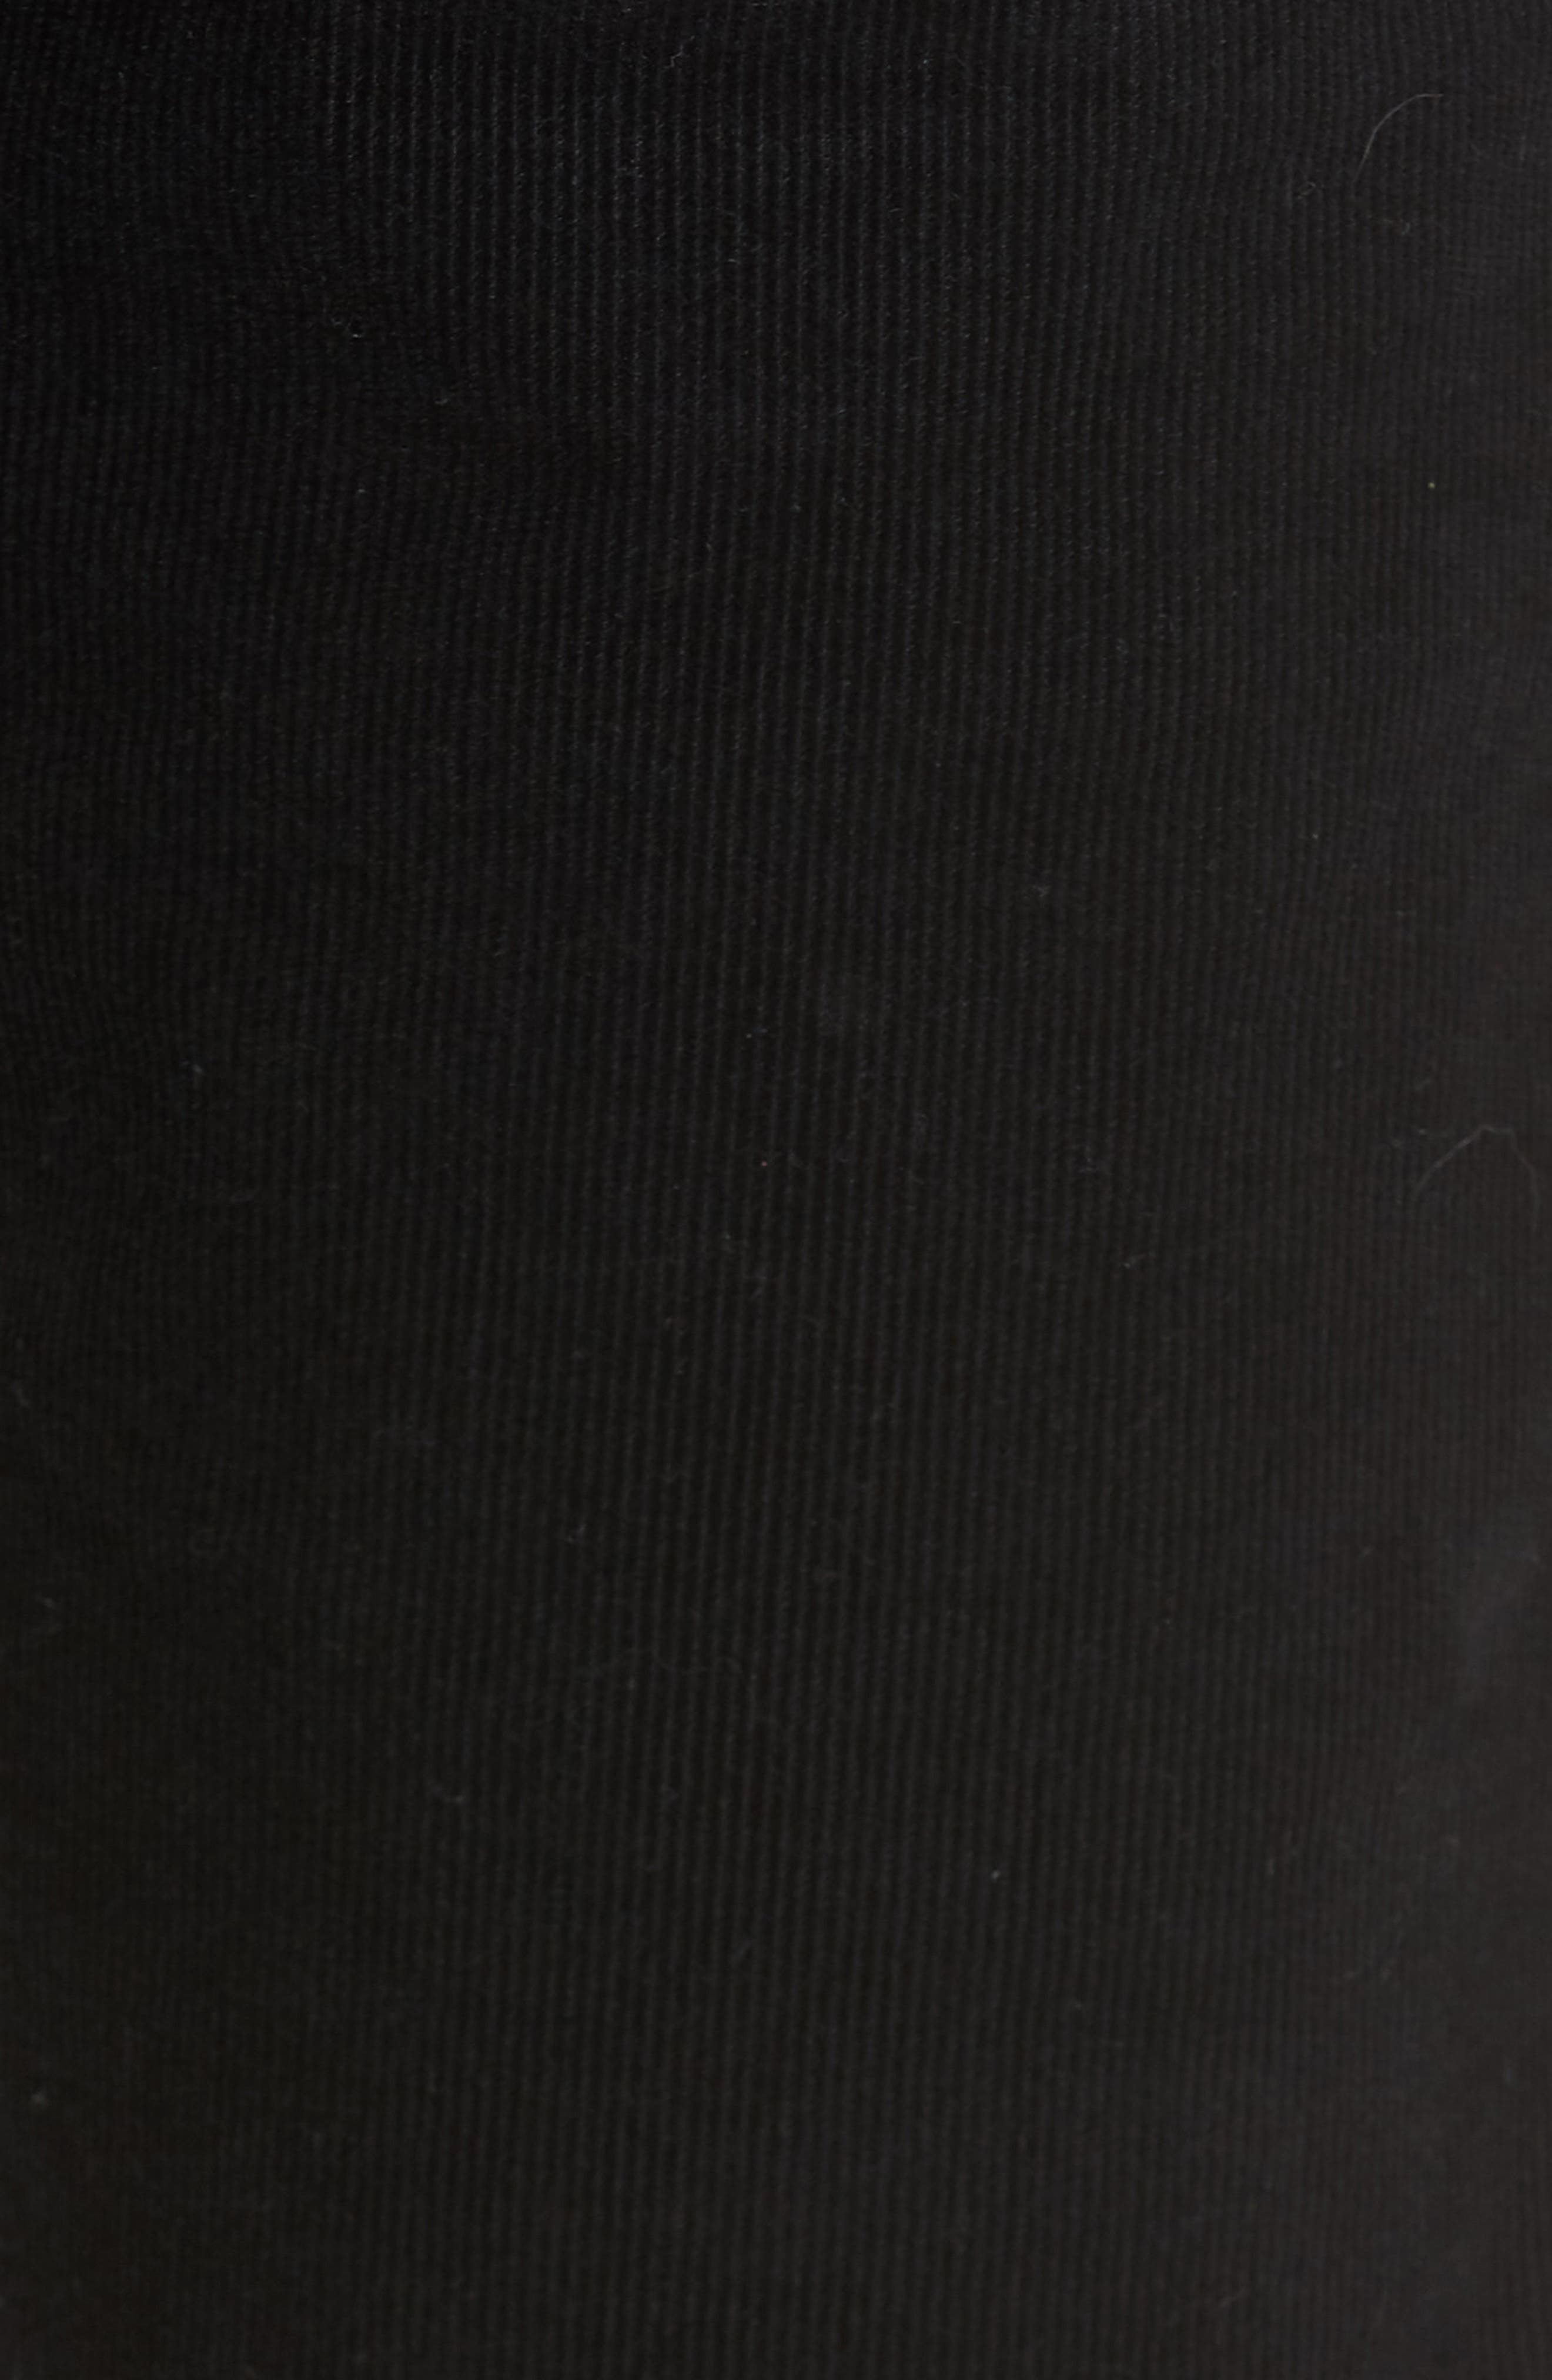 Dylan Skinny Fit Corduroy Pants,                             Alternate thumbnail 5, color,                             Sulfur True Black